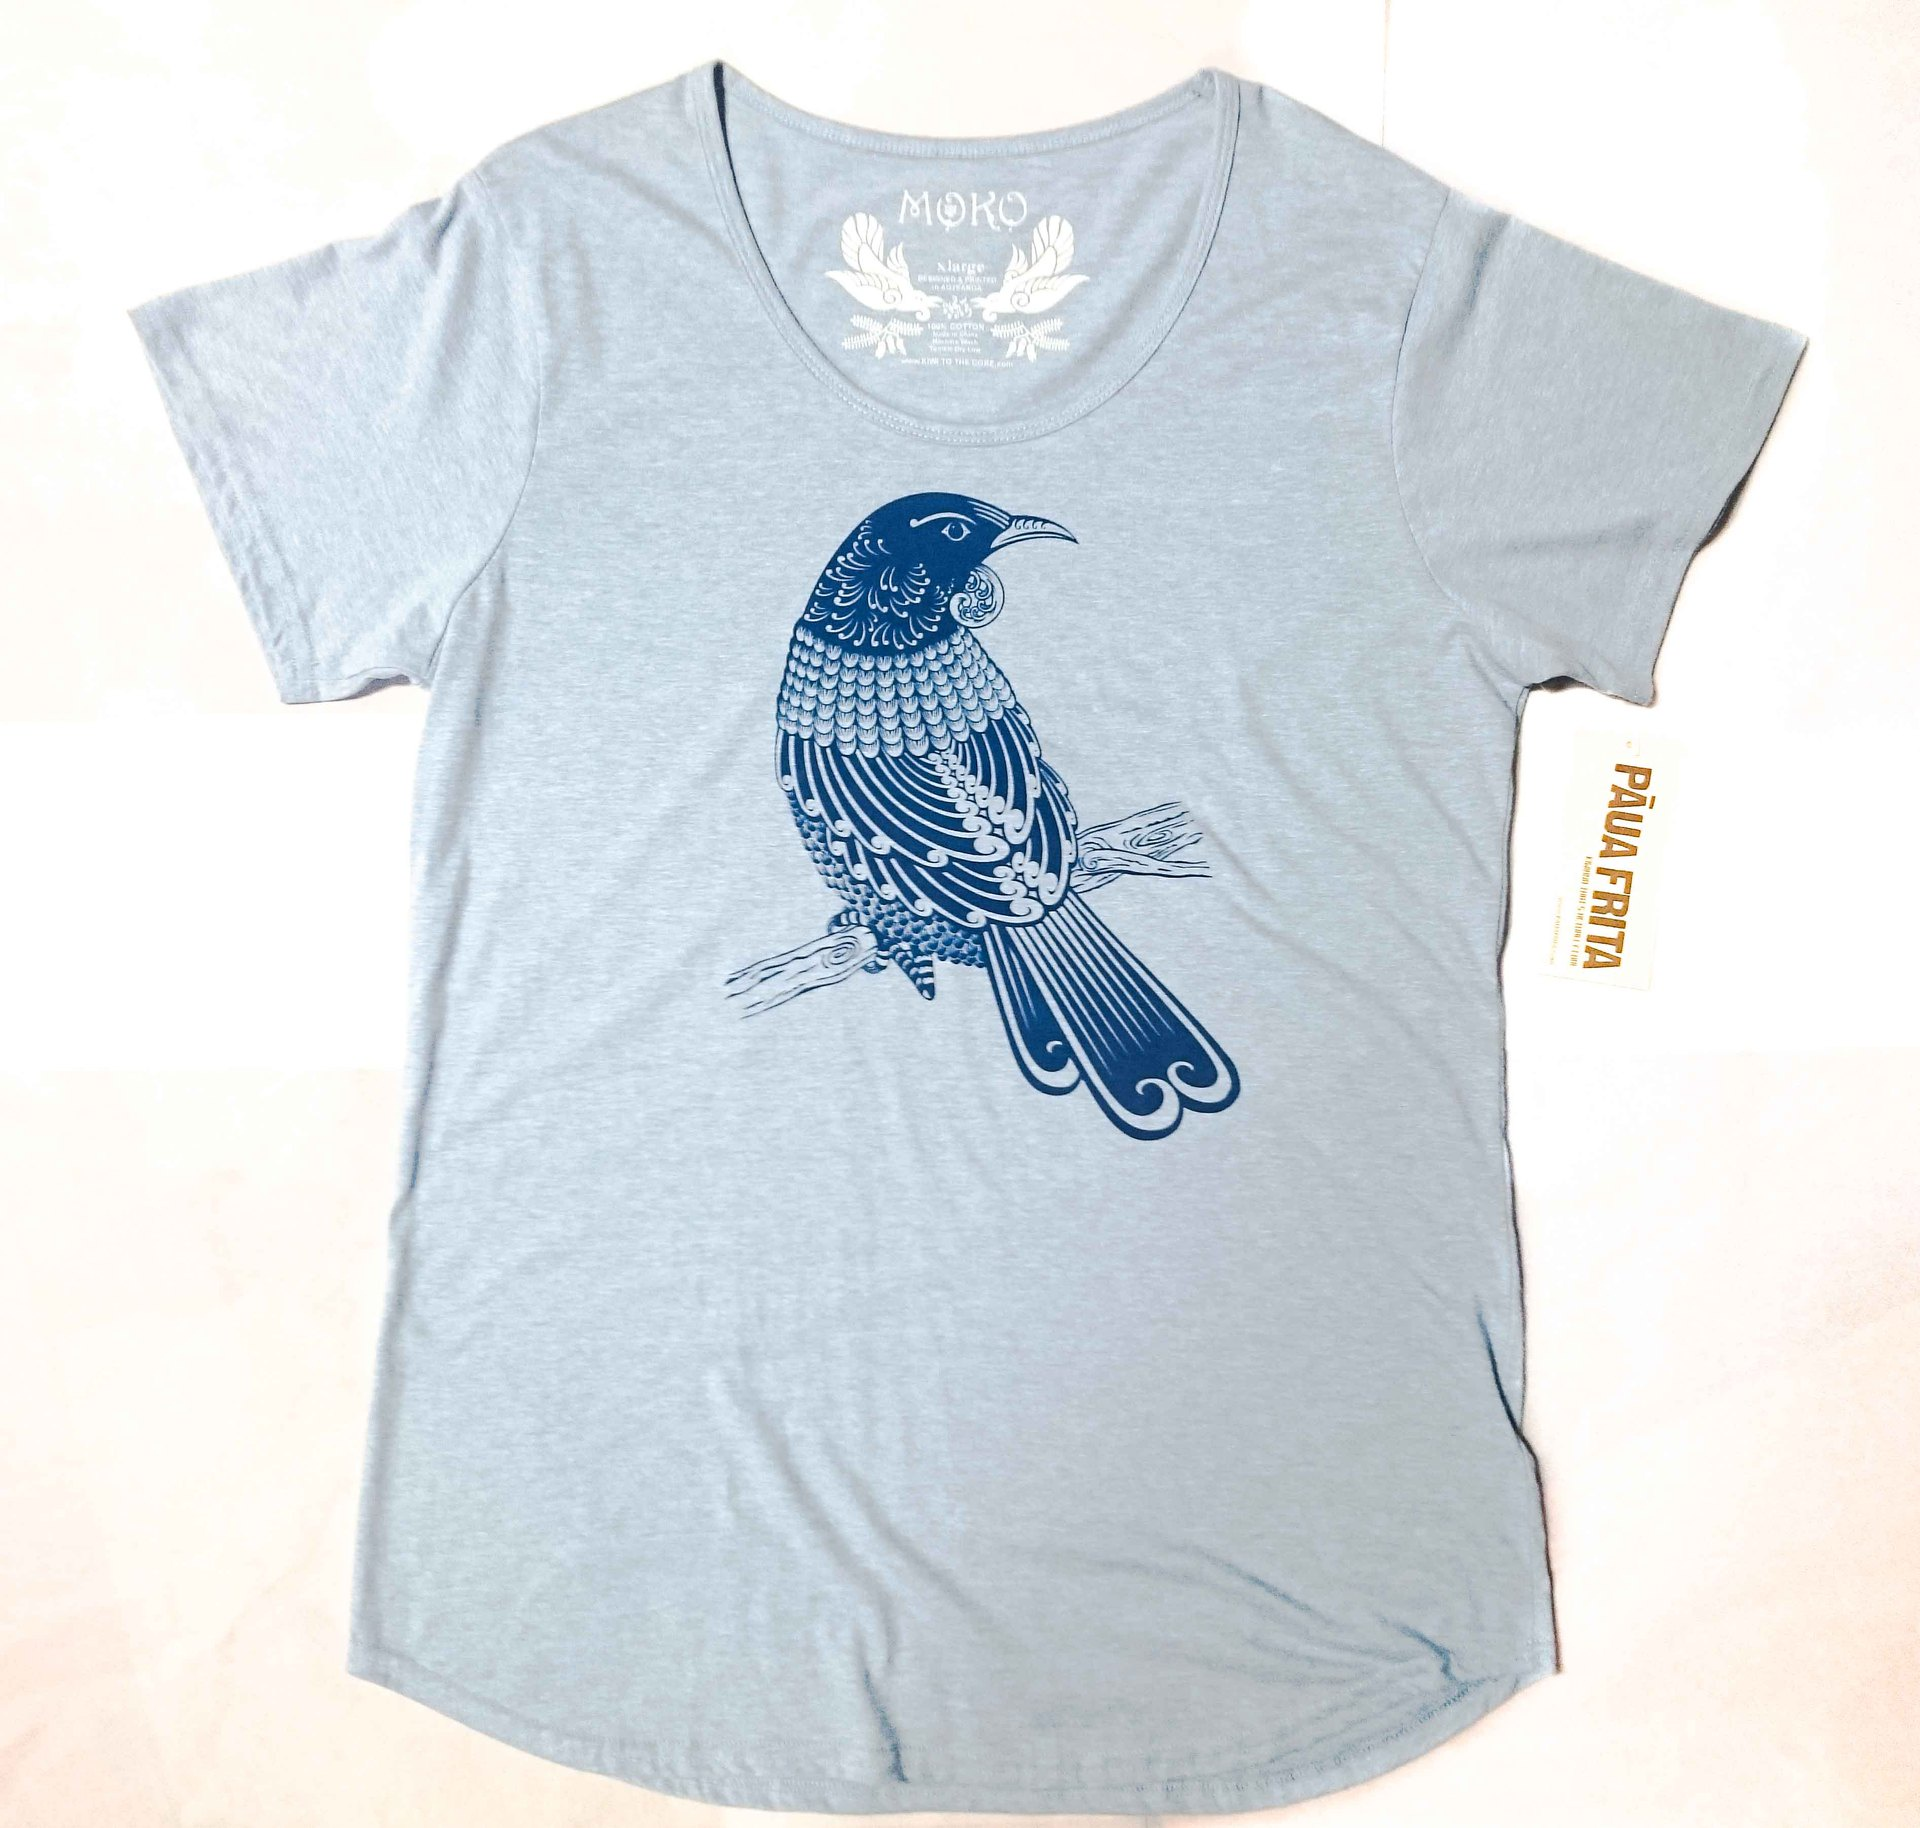 Tui S/S T-Shirt Heathered Blue